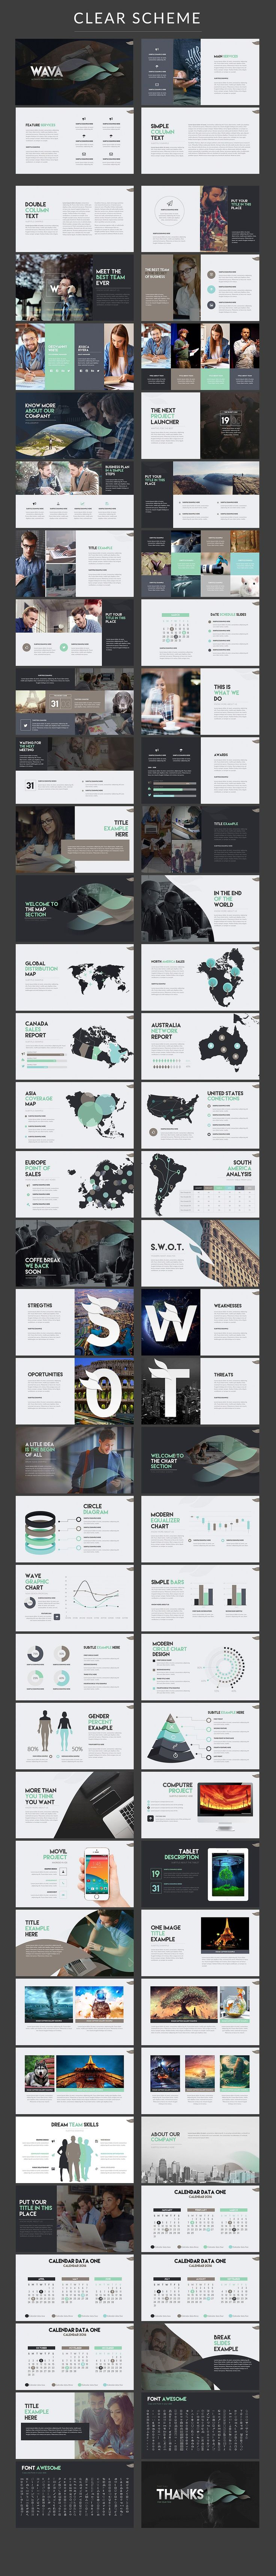 Wava | Powerpoint template + Bonus by Zacomic Studios on @creativemarket